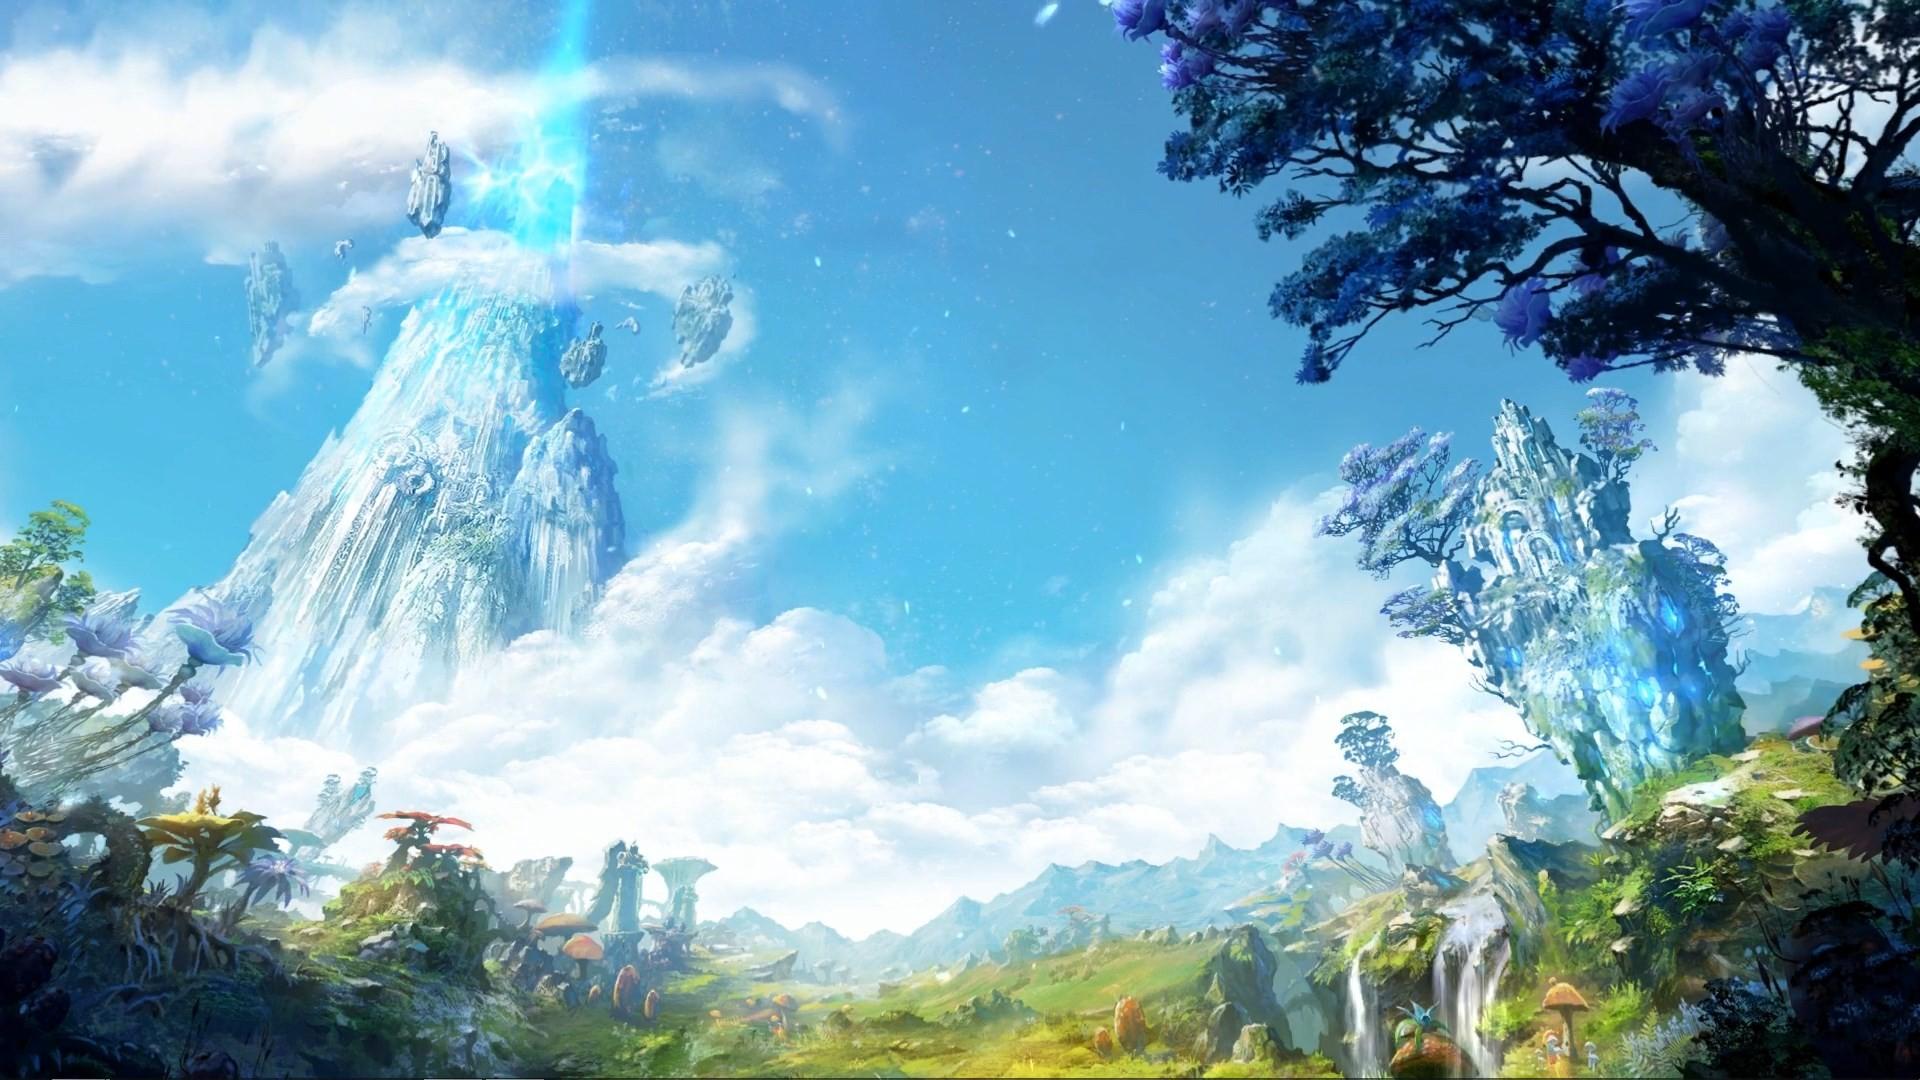 General 1920x1080 landscape fantasy art Aion Online mushroom clouds ruins cyan